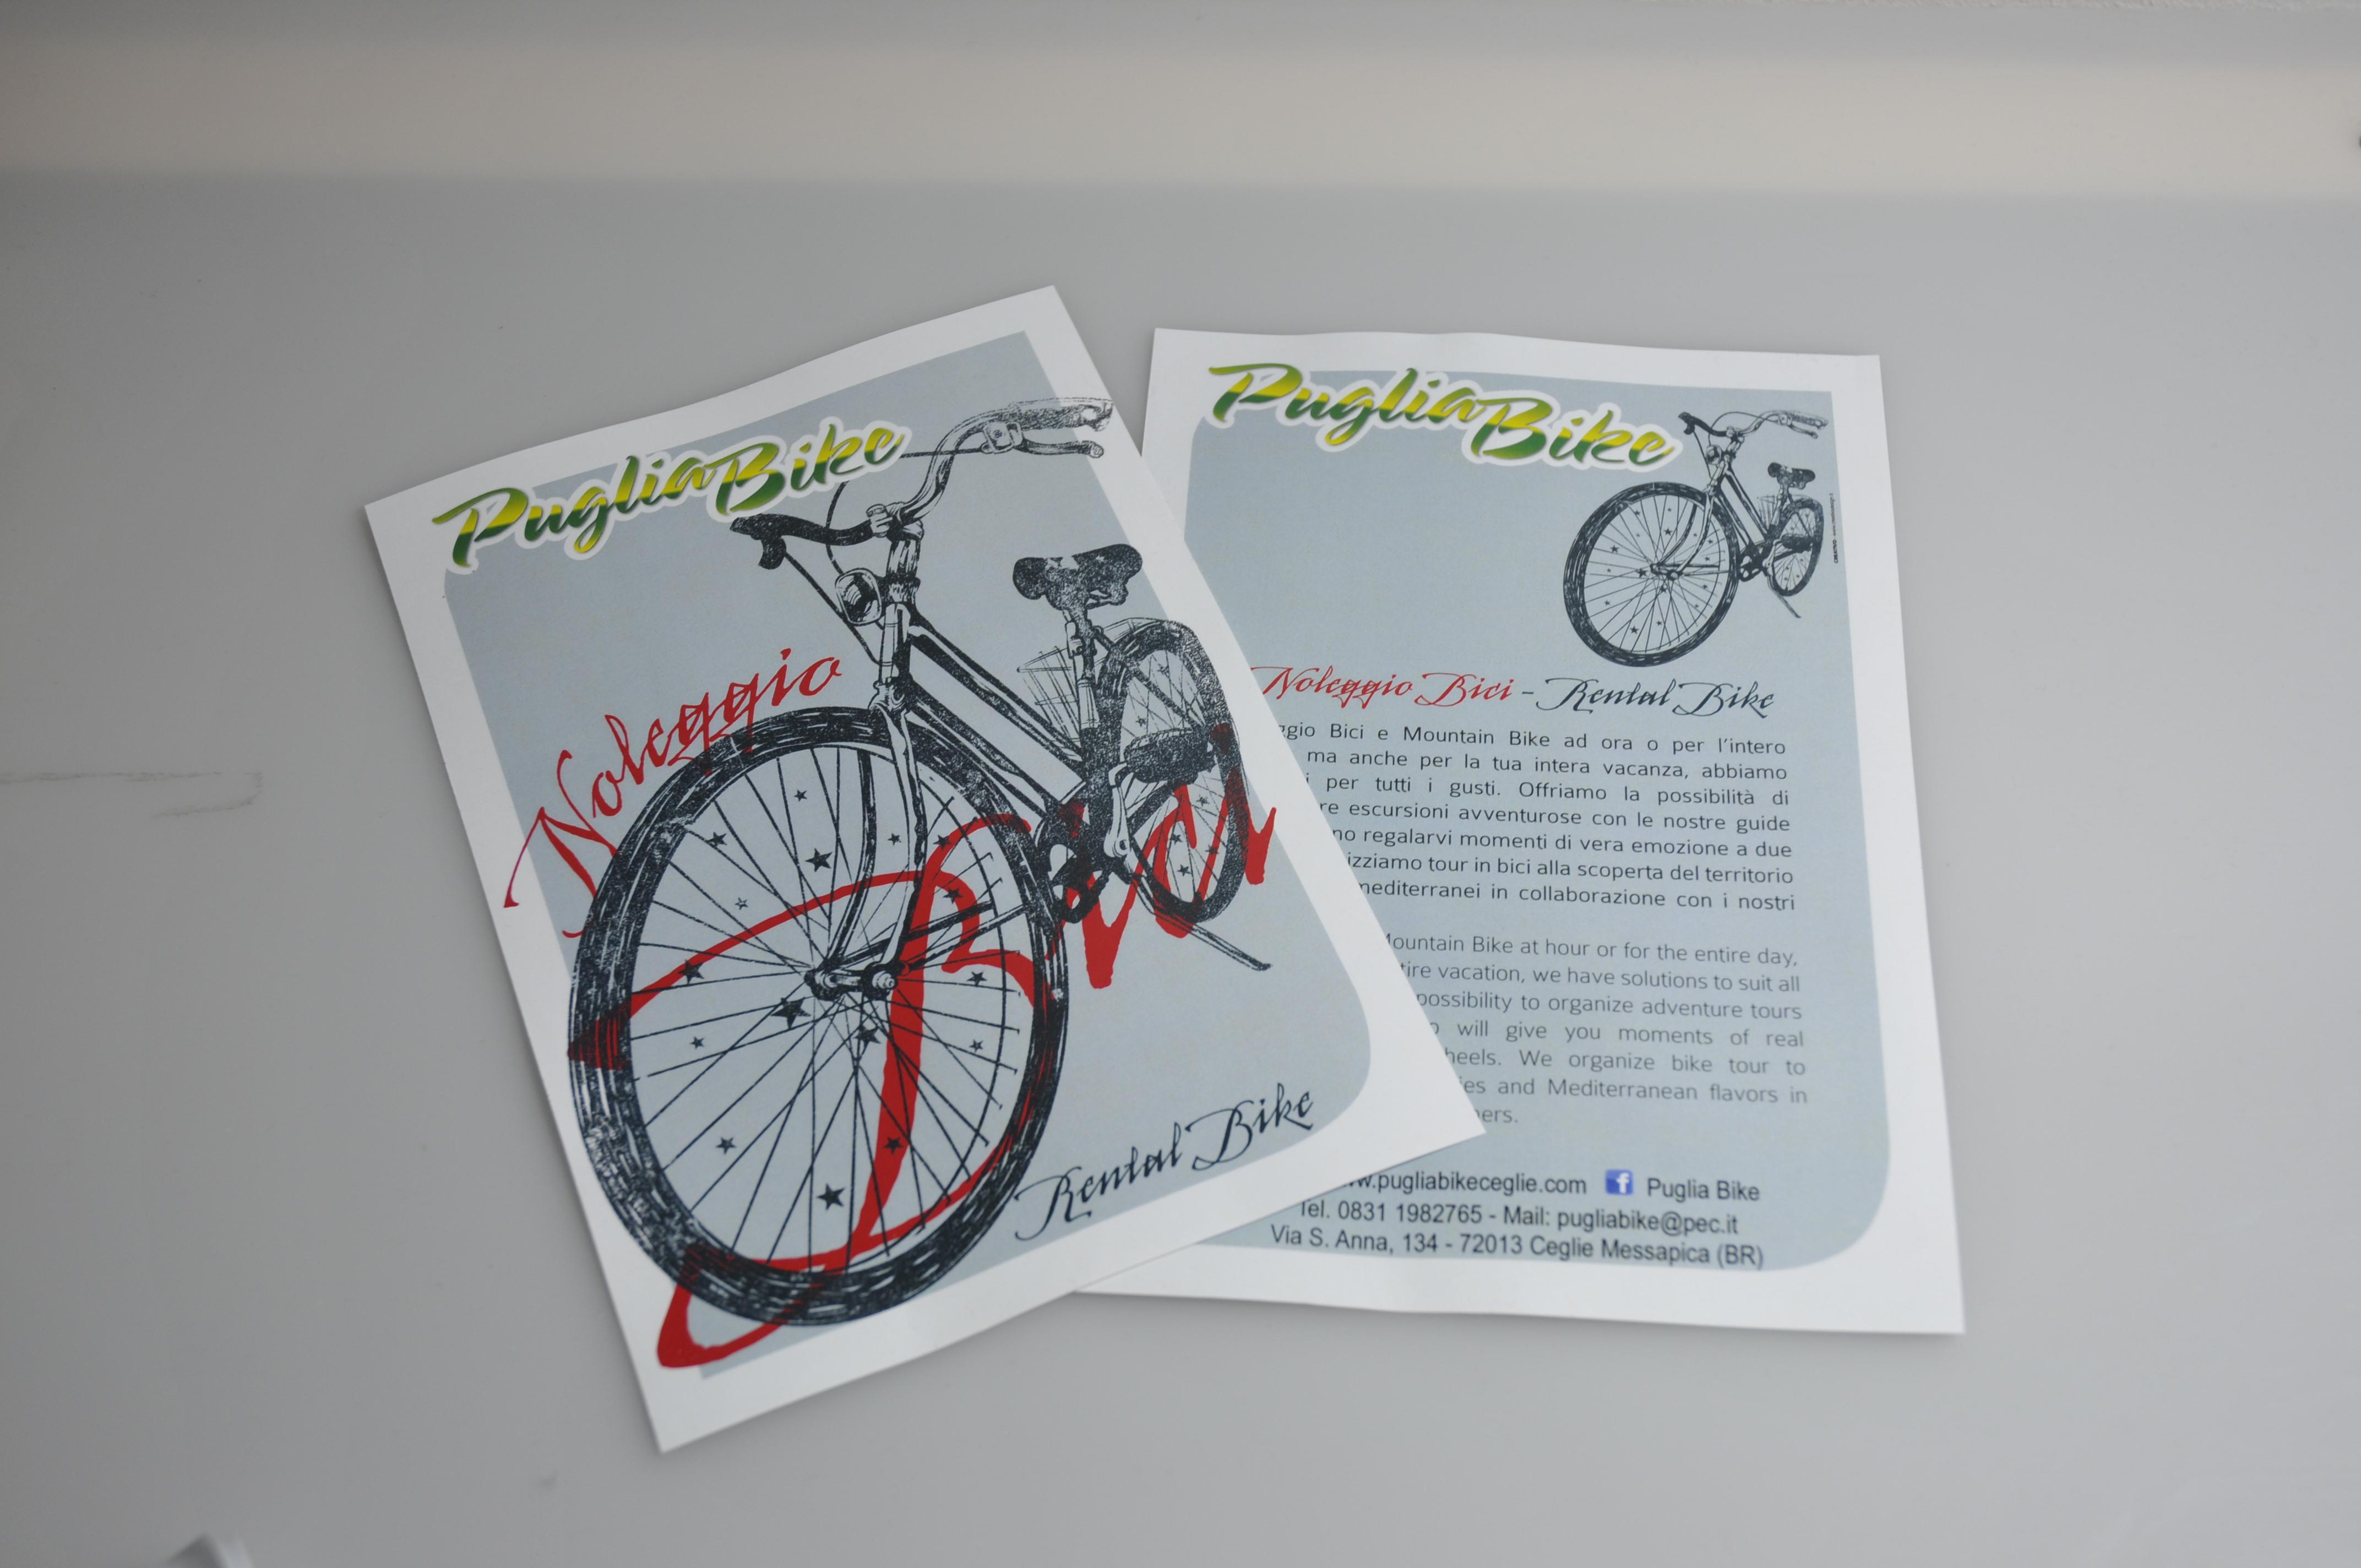 Volantino - Puglia Bike